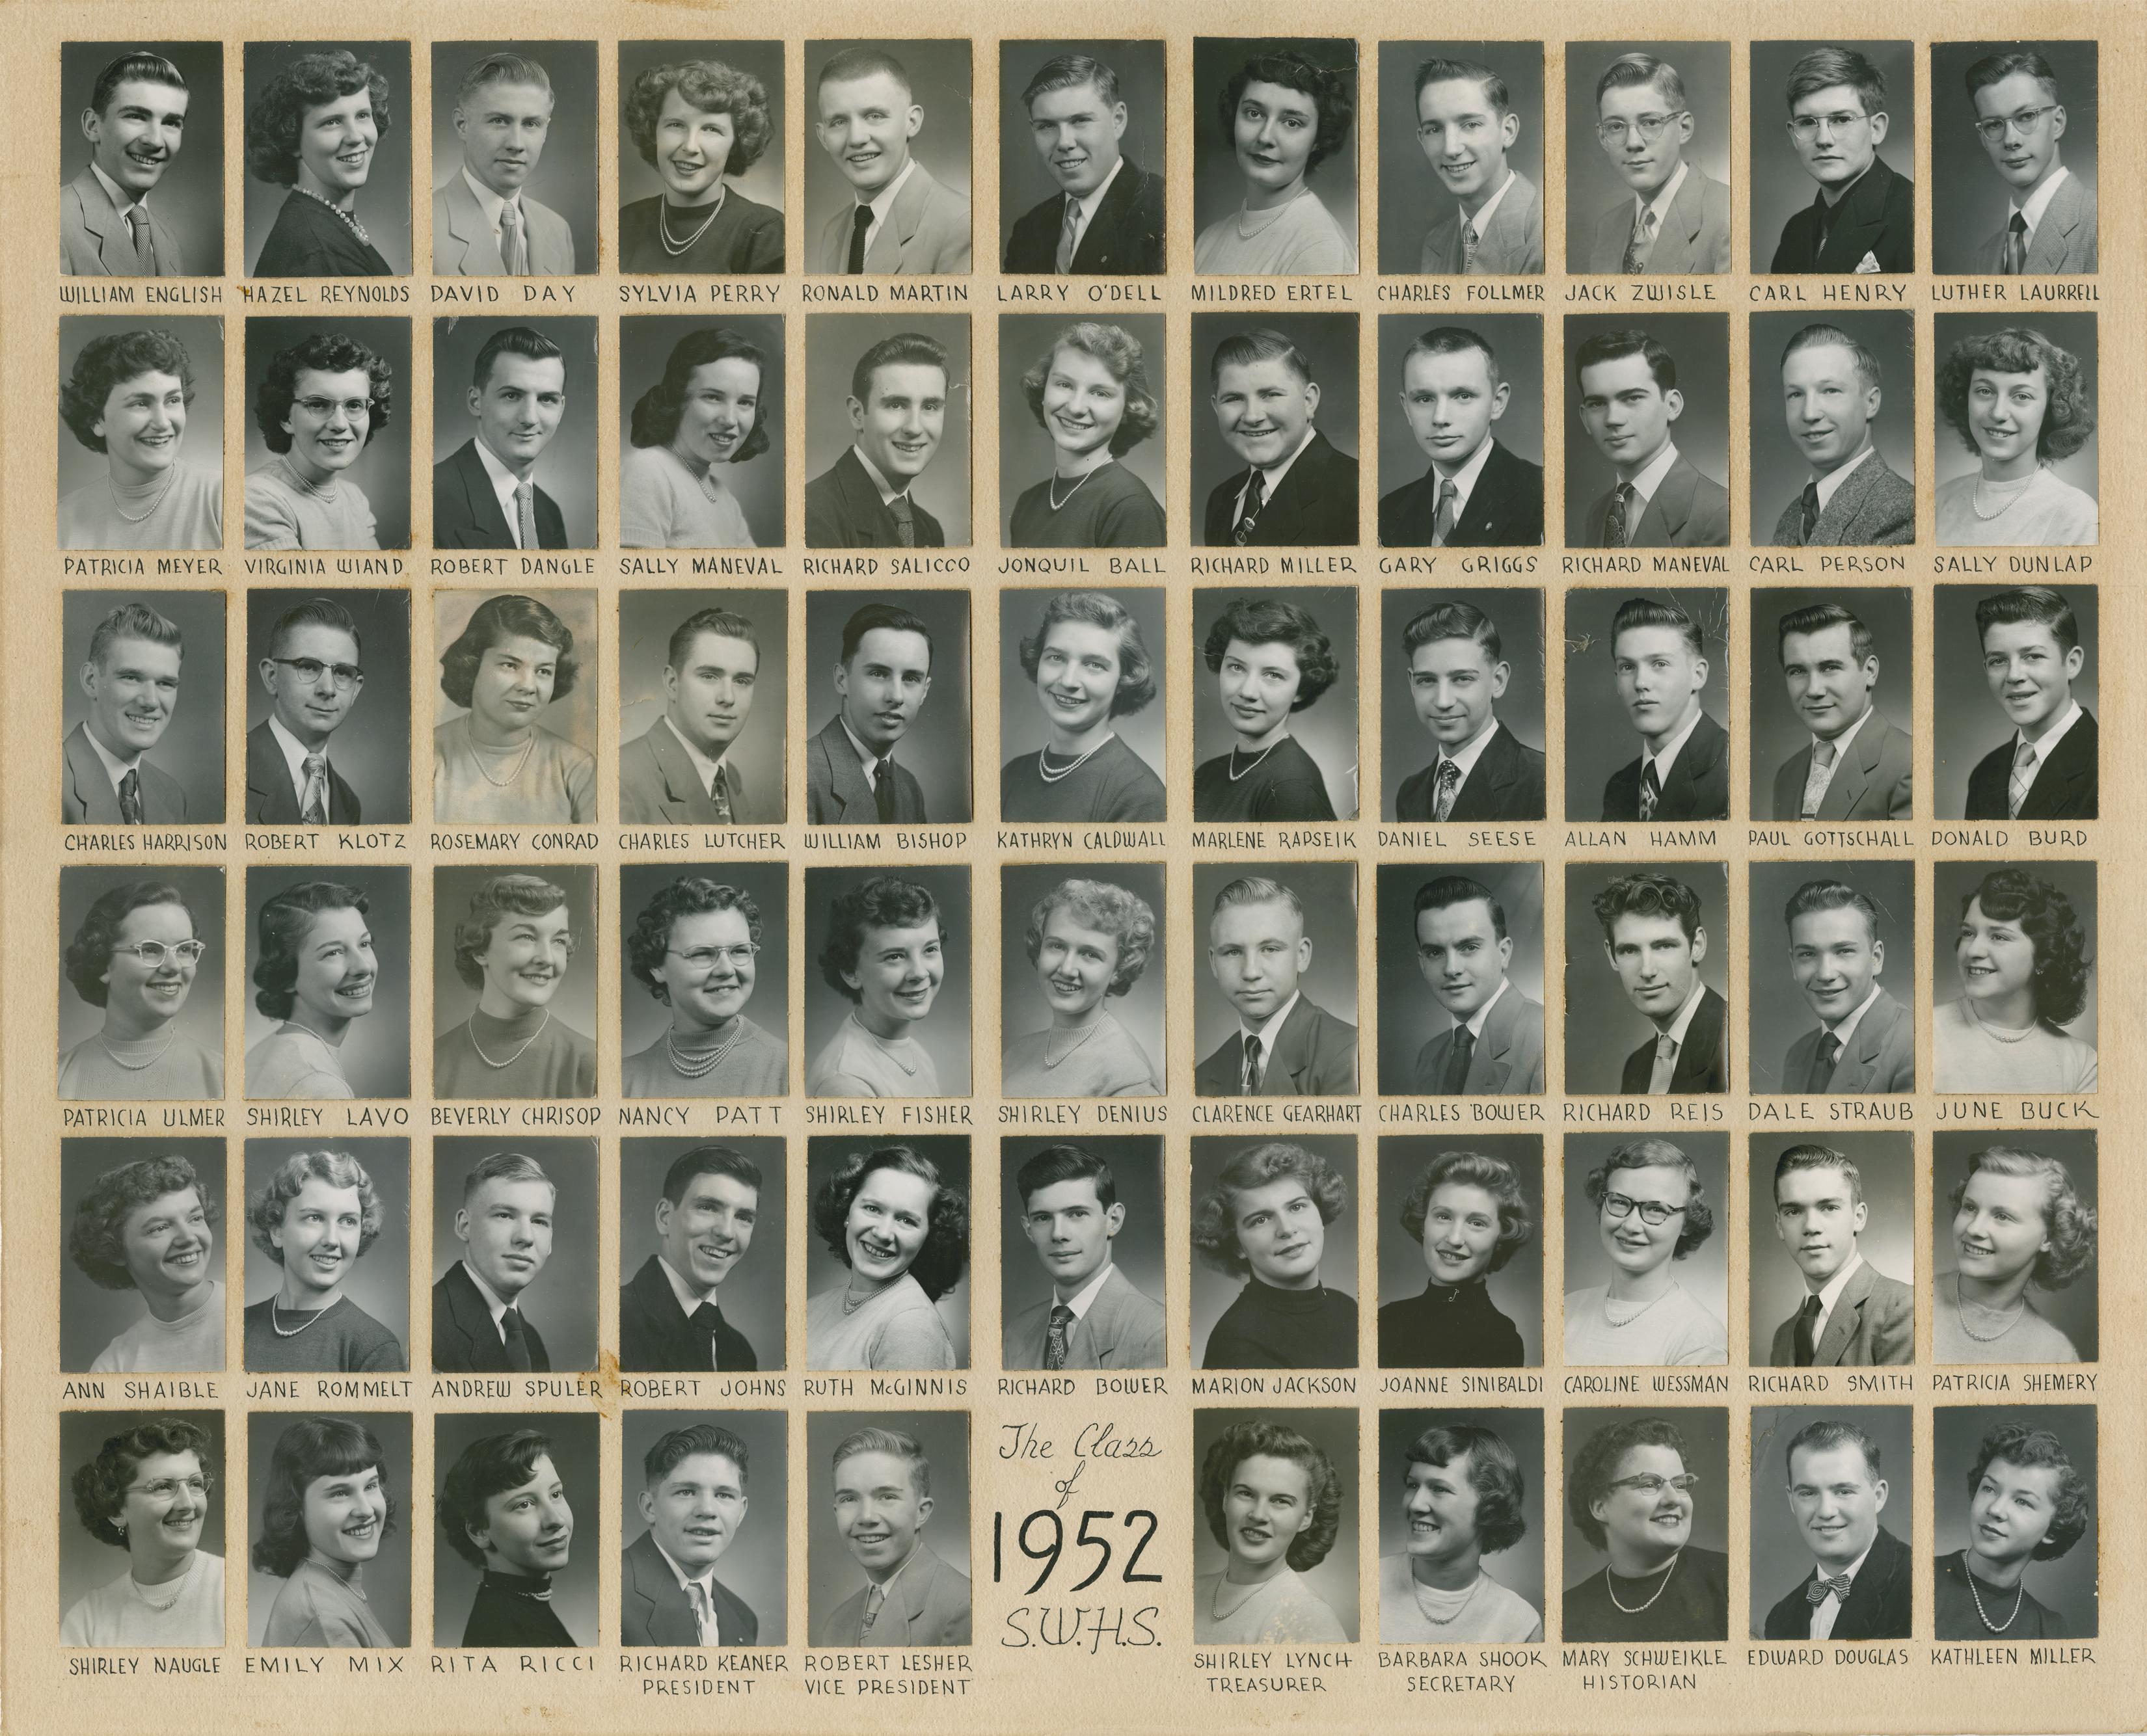 Class of 1952